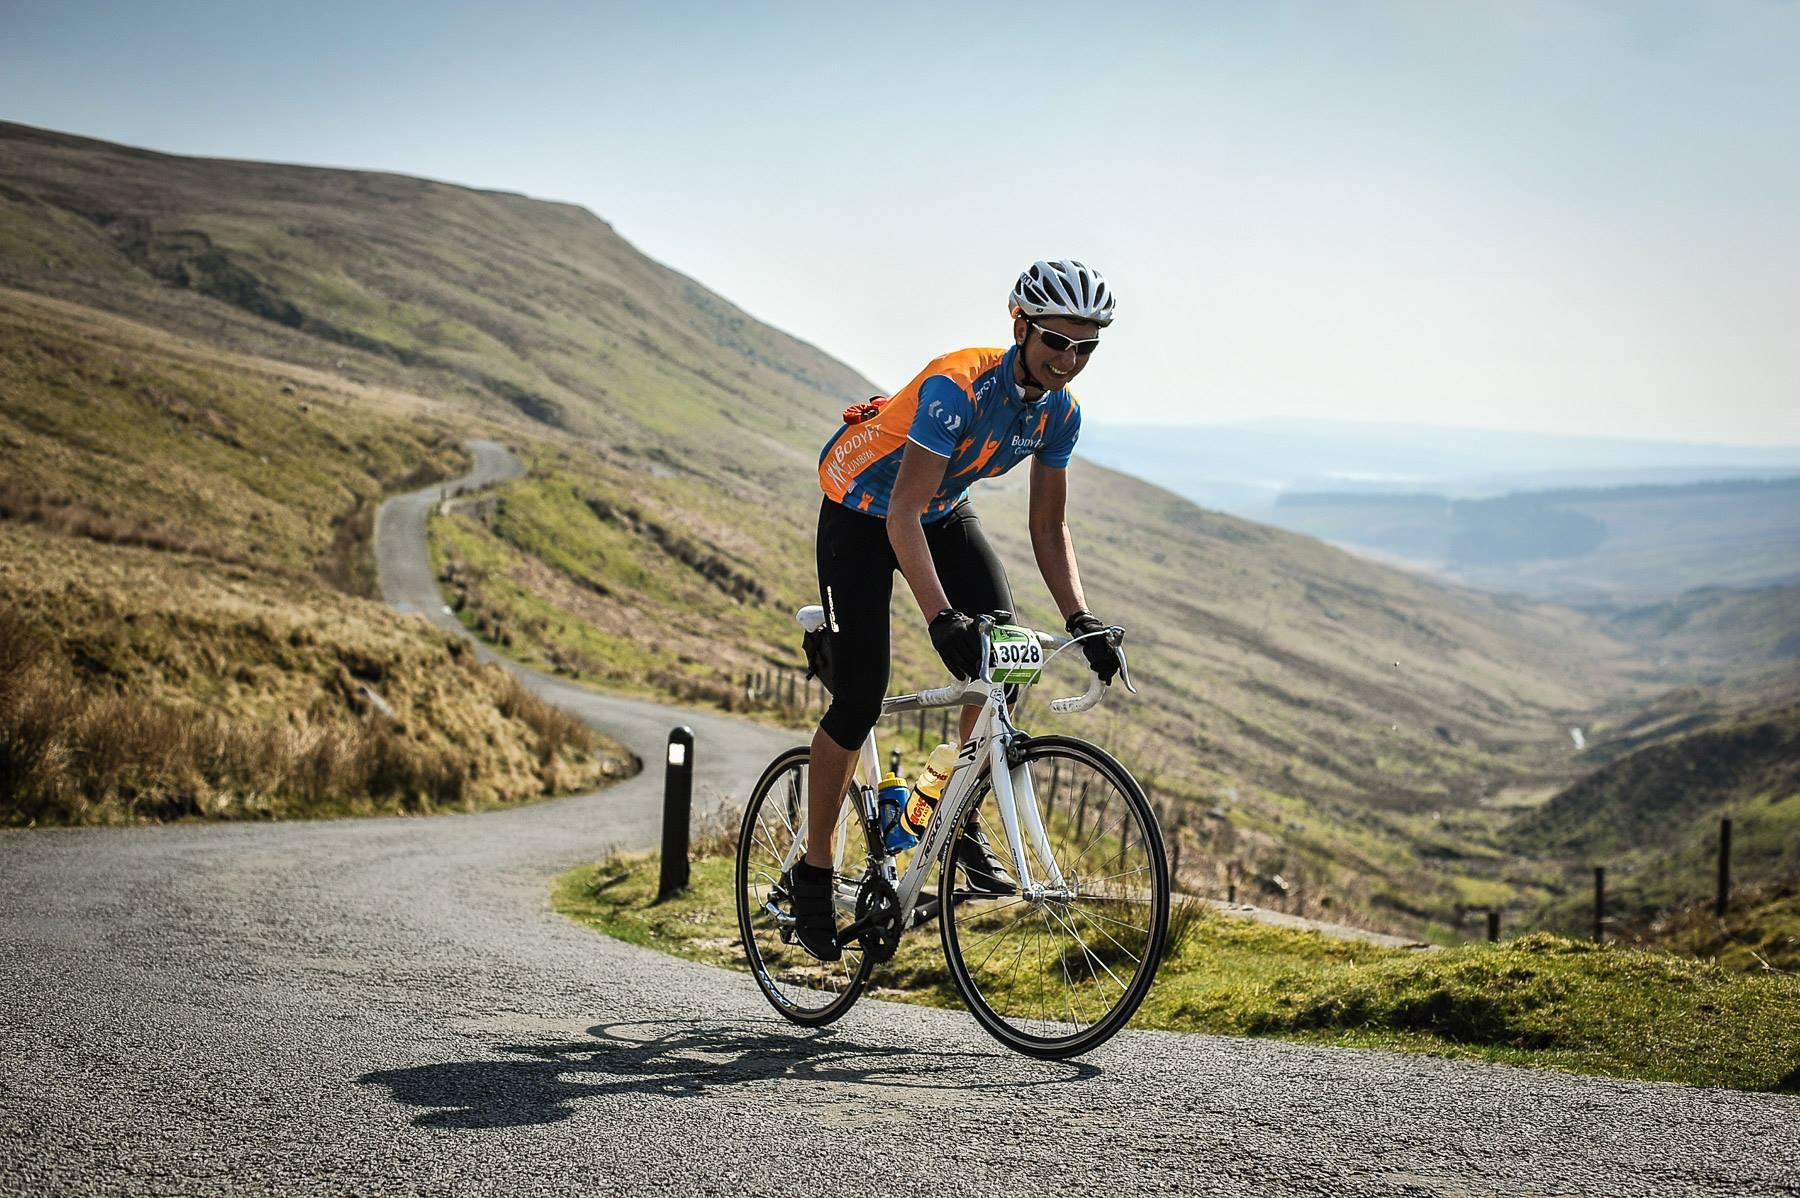 Sam Ayers Biking